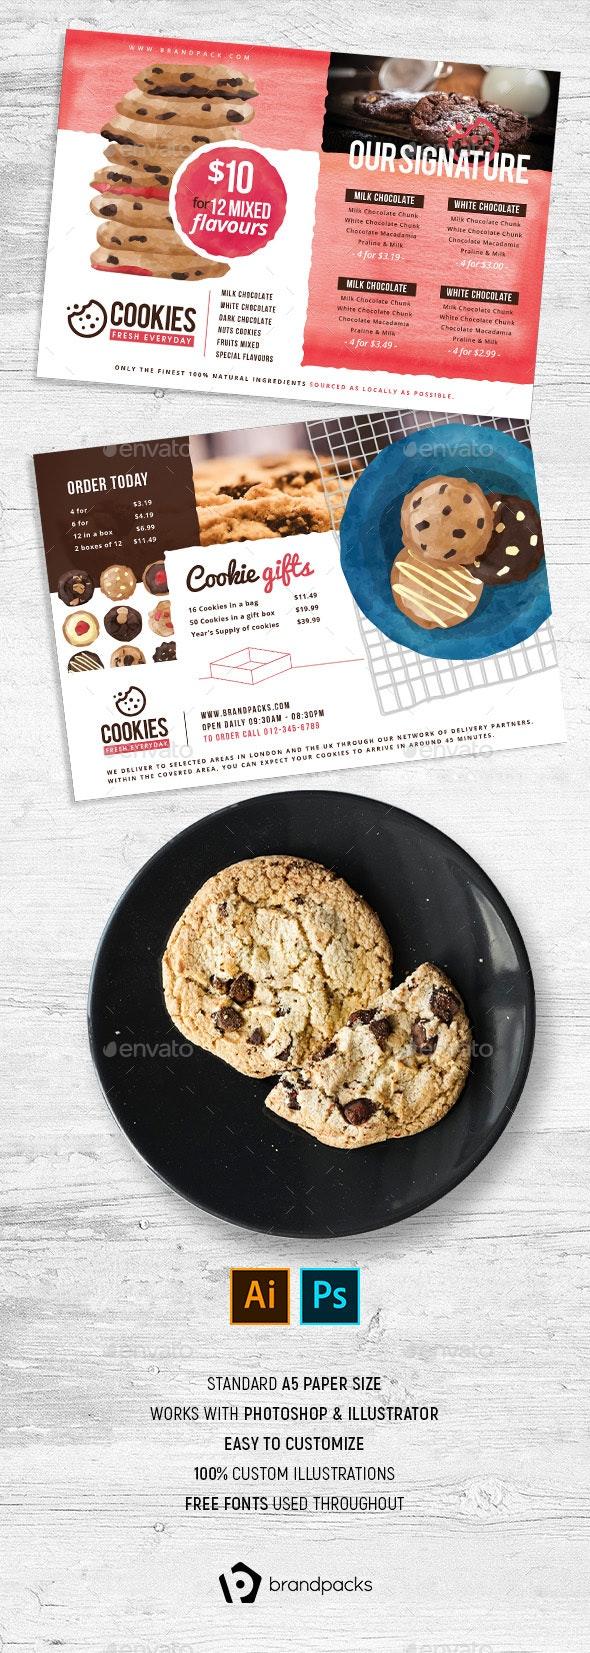 Cookie Shop Flyers - Restaurant Flyers